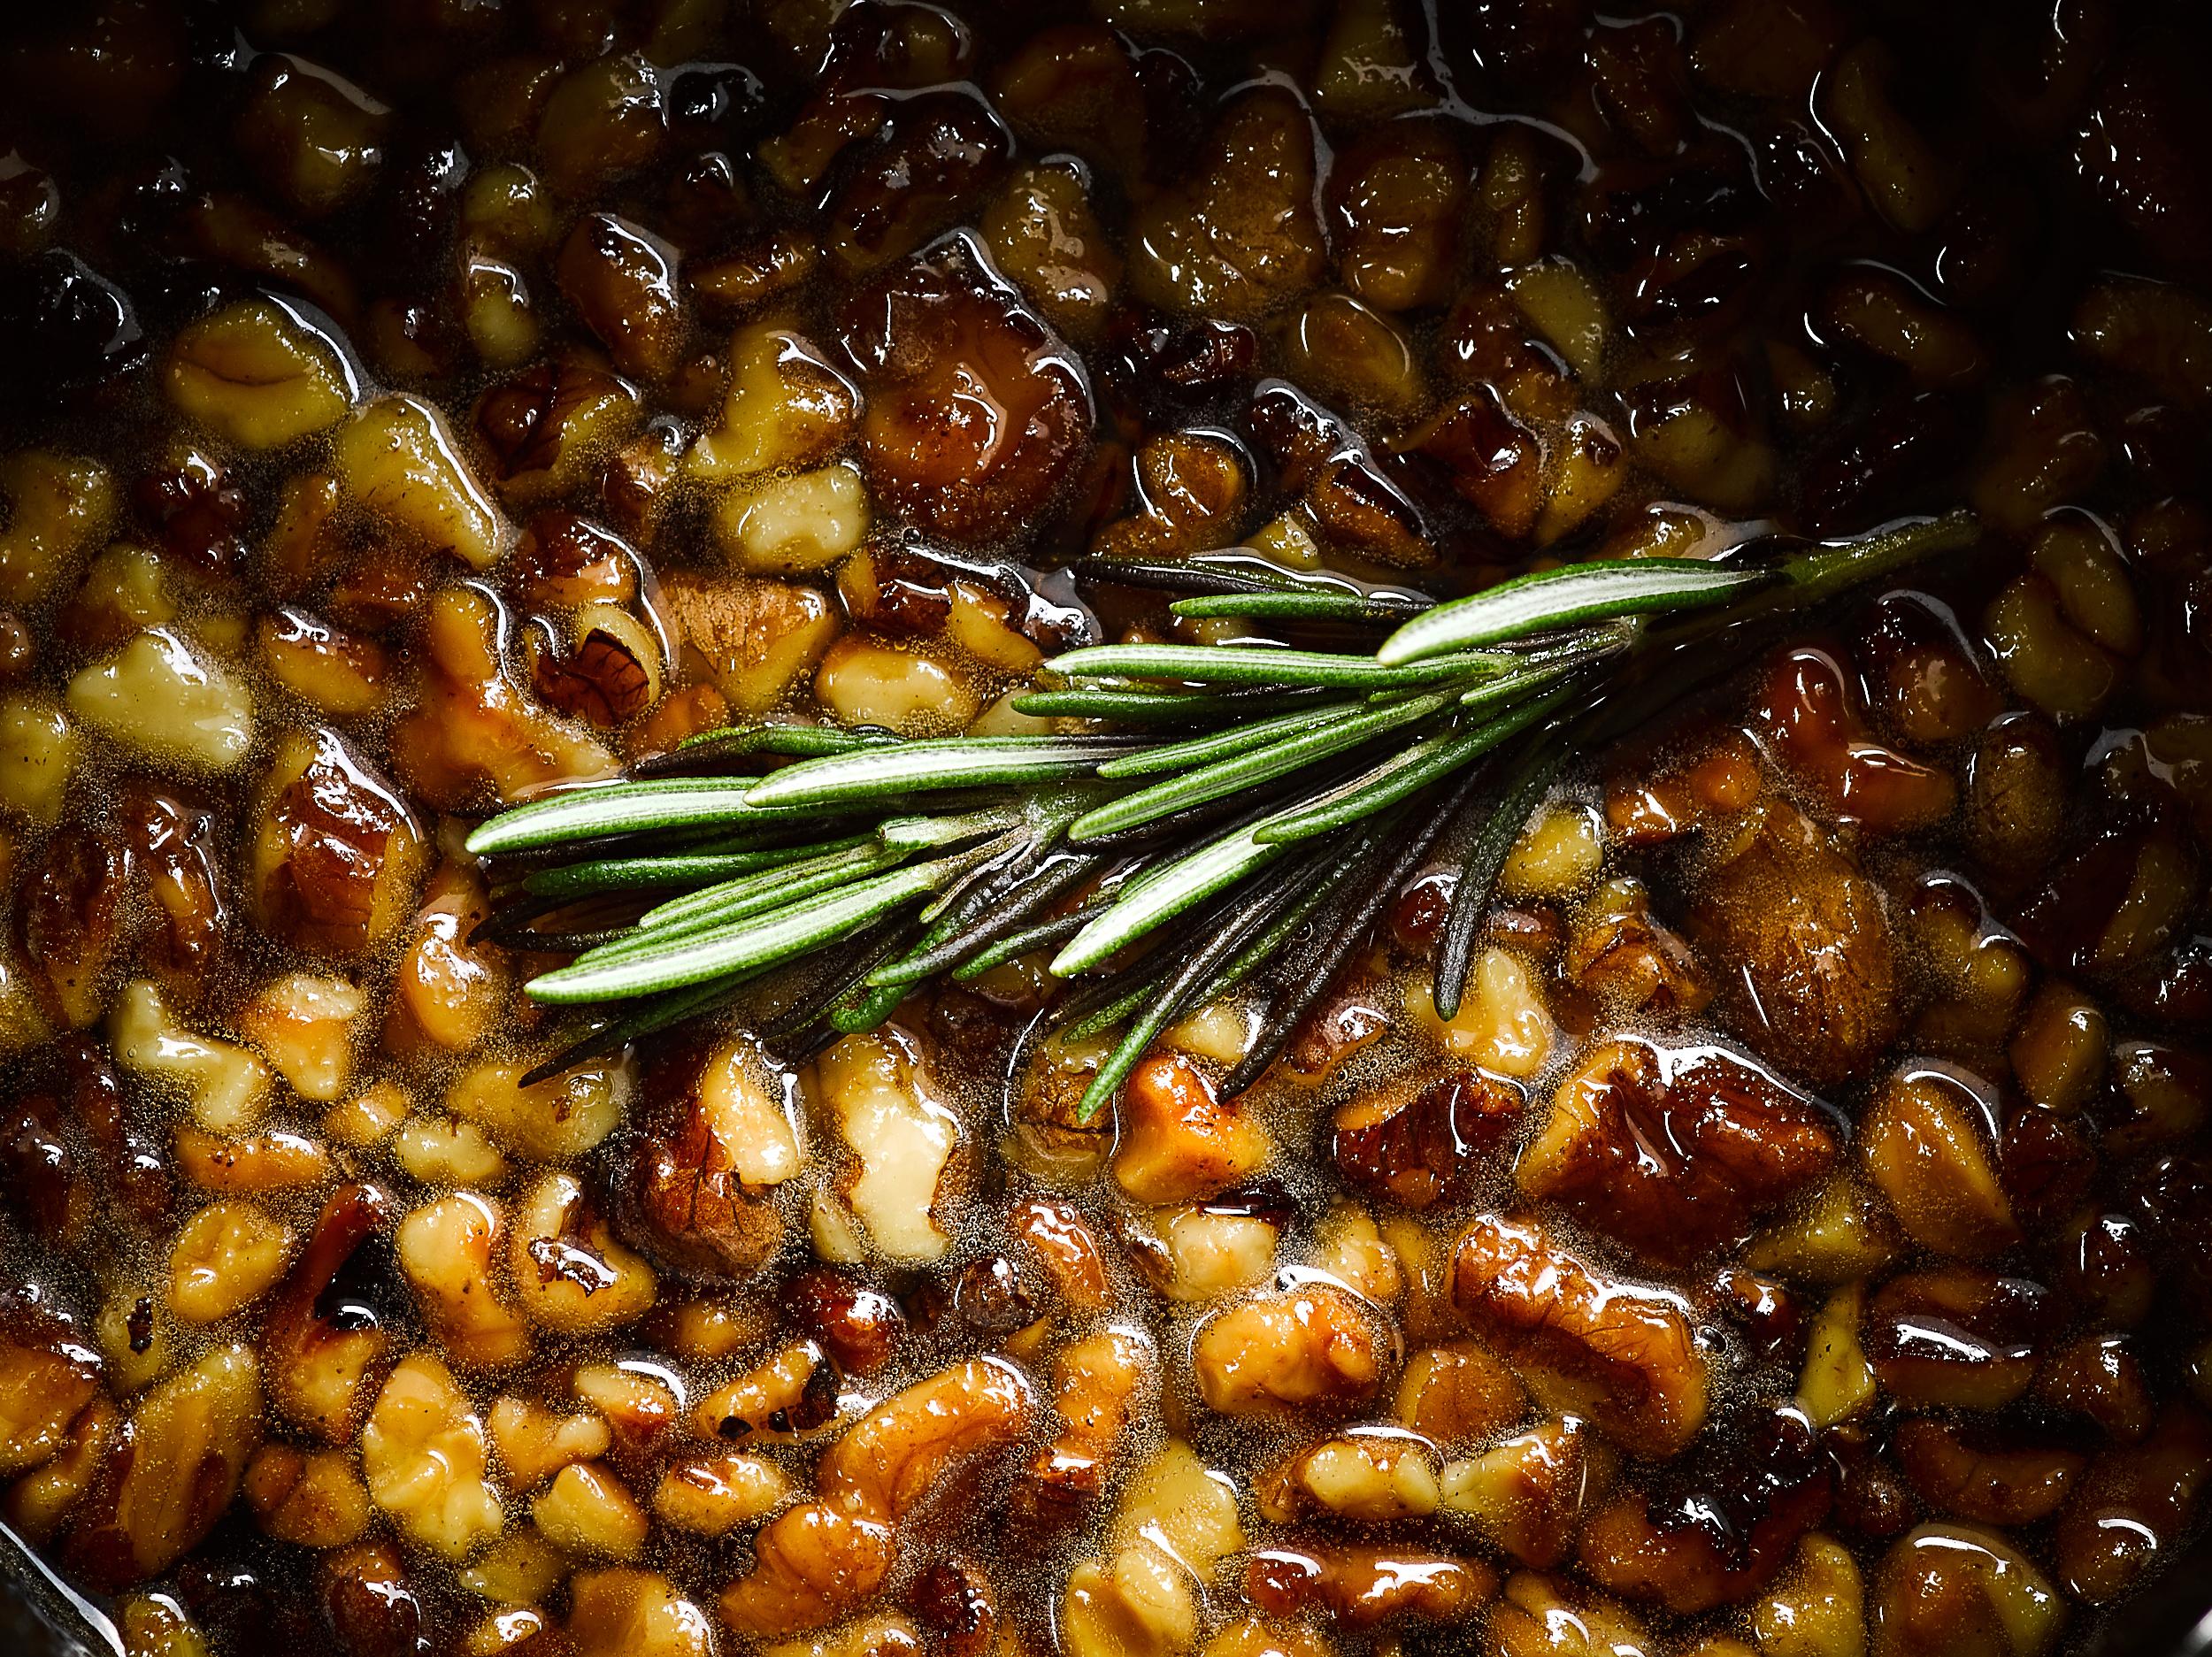 Honey walnut sauce